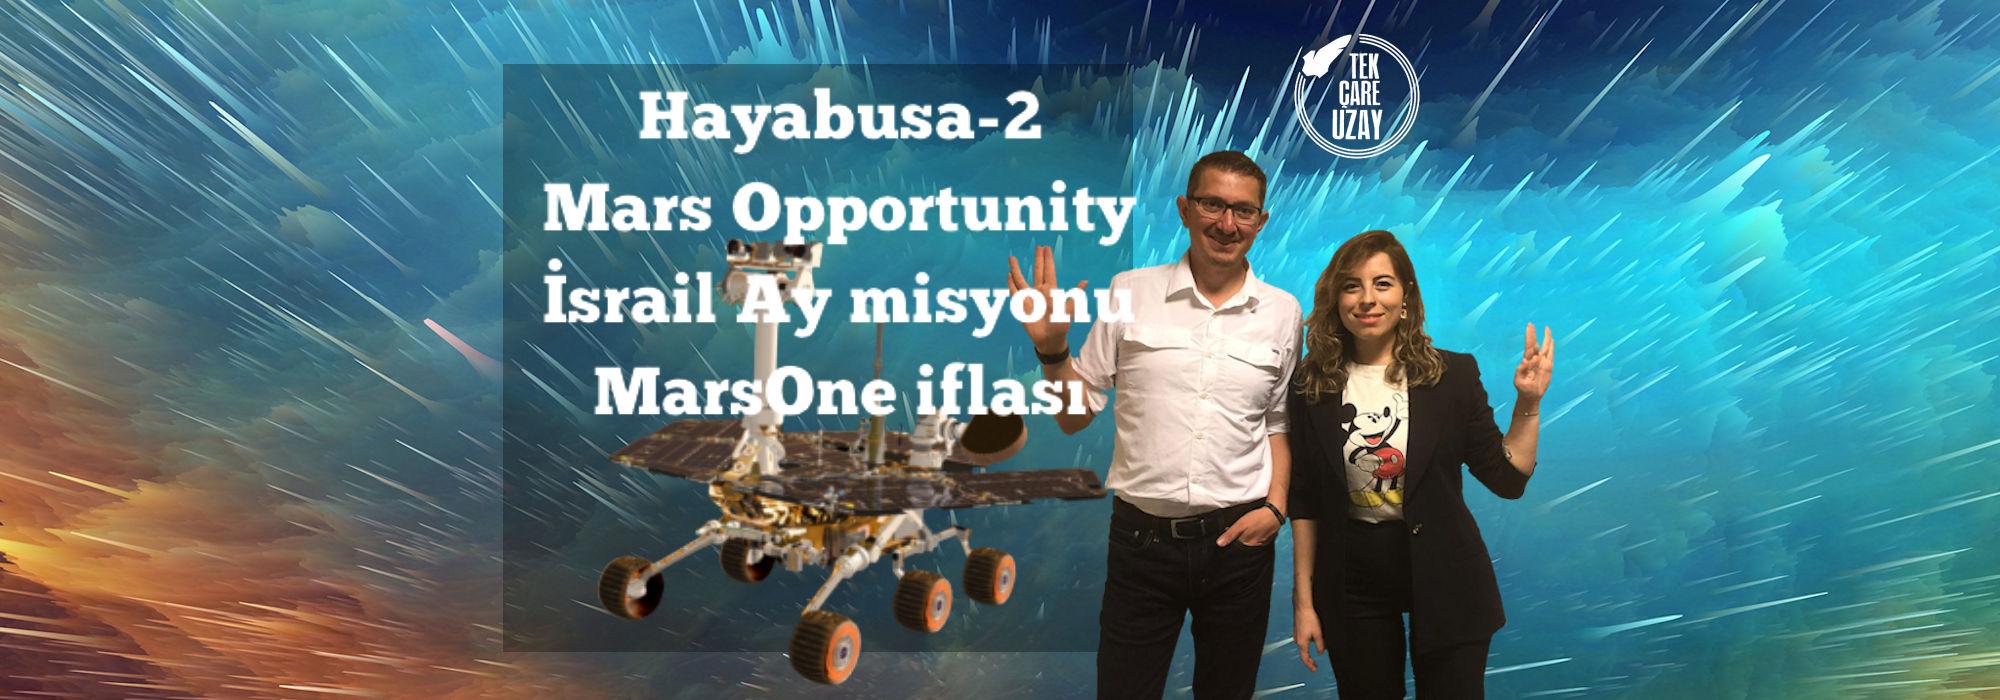 Tek Çare Uzay | Hayabusa2, Mars Opportunity, İsrail Ay Misyonu, Mars One iflası